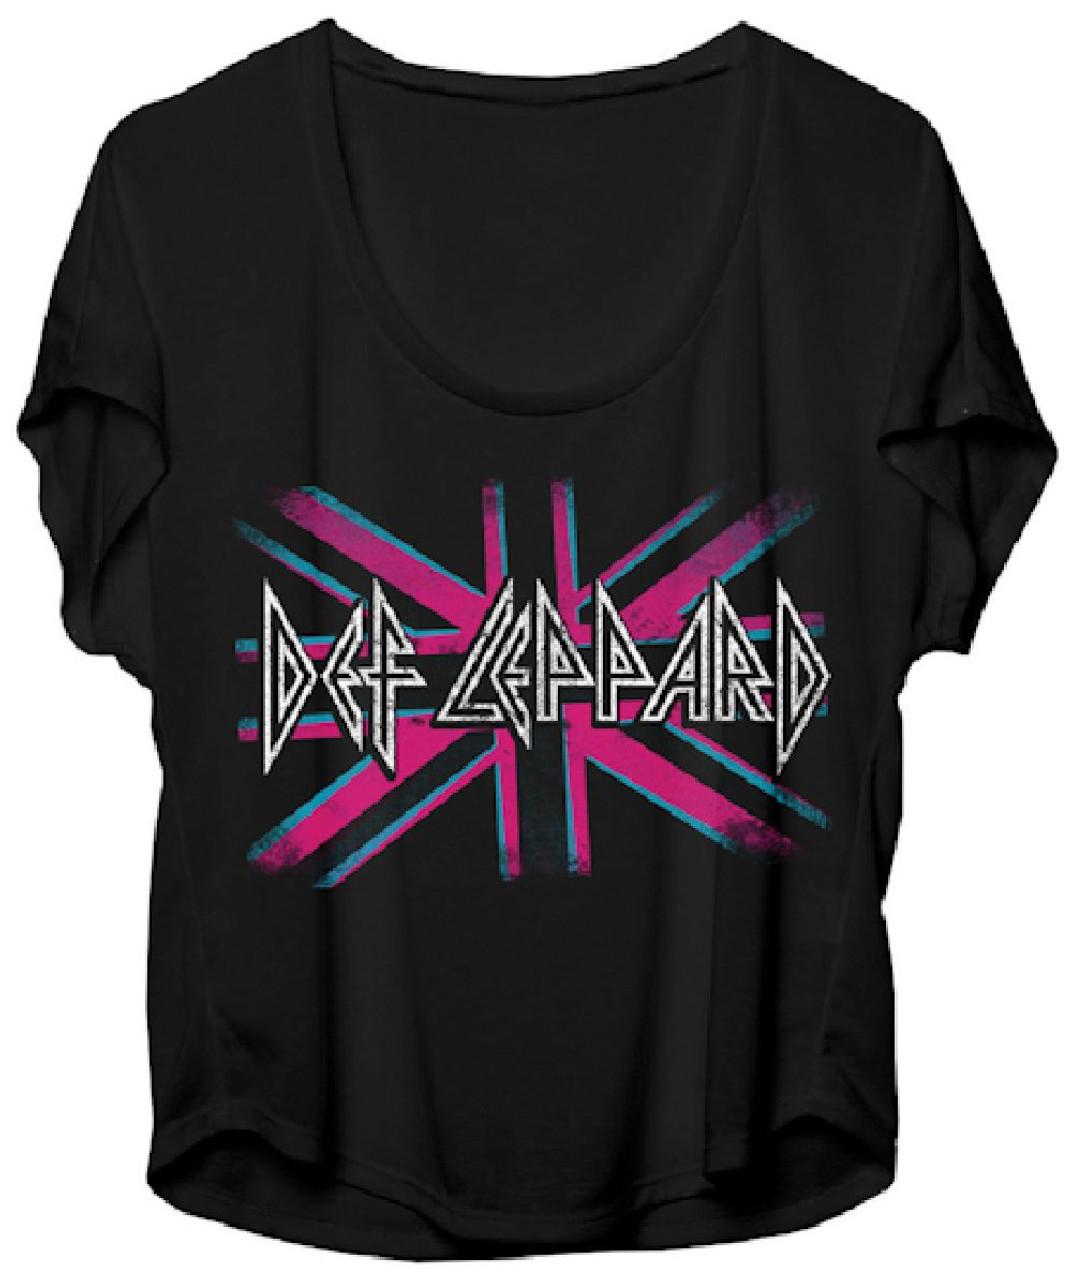 7f47a580 Def Leppard Women's T-shirt - British Flag Logo. Black Dolman Shirt ...